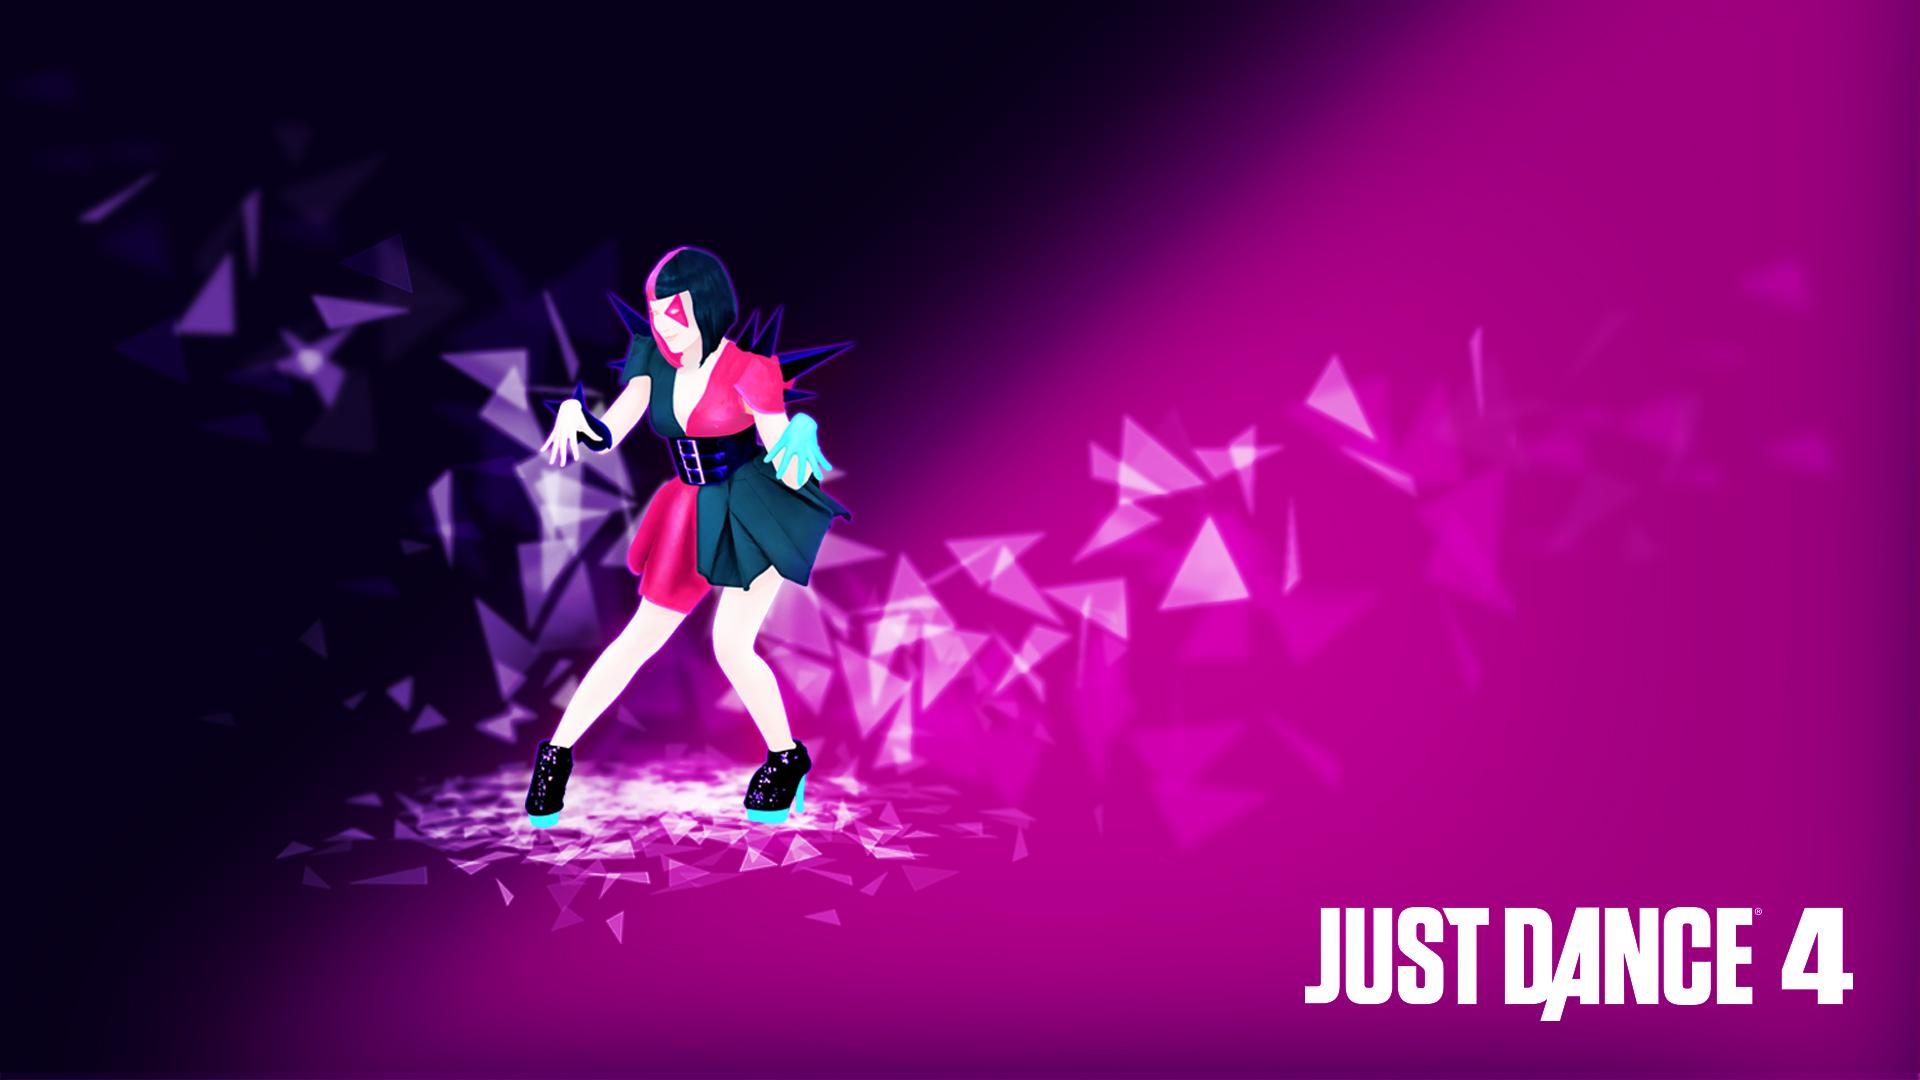 Just Dance 4  Disturbia Wallpaper Just dance Pinterest 1920x1080